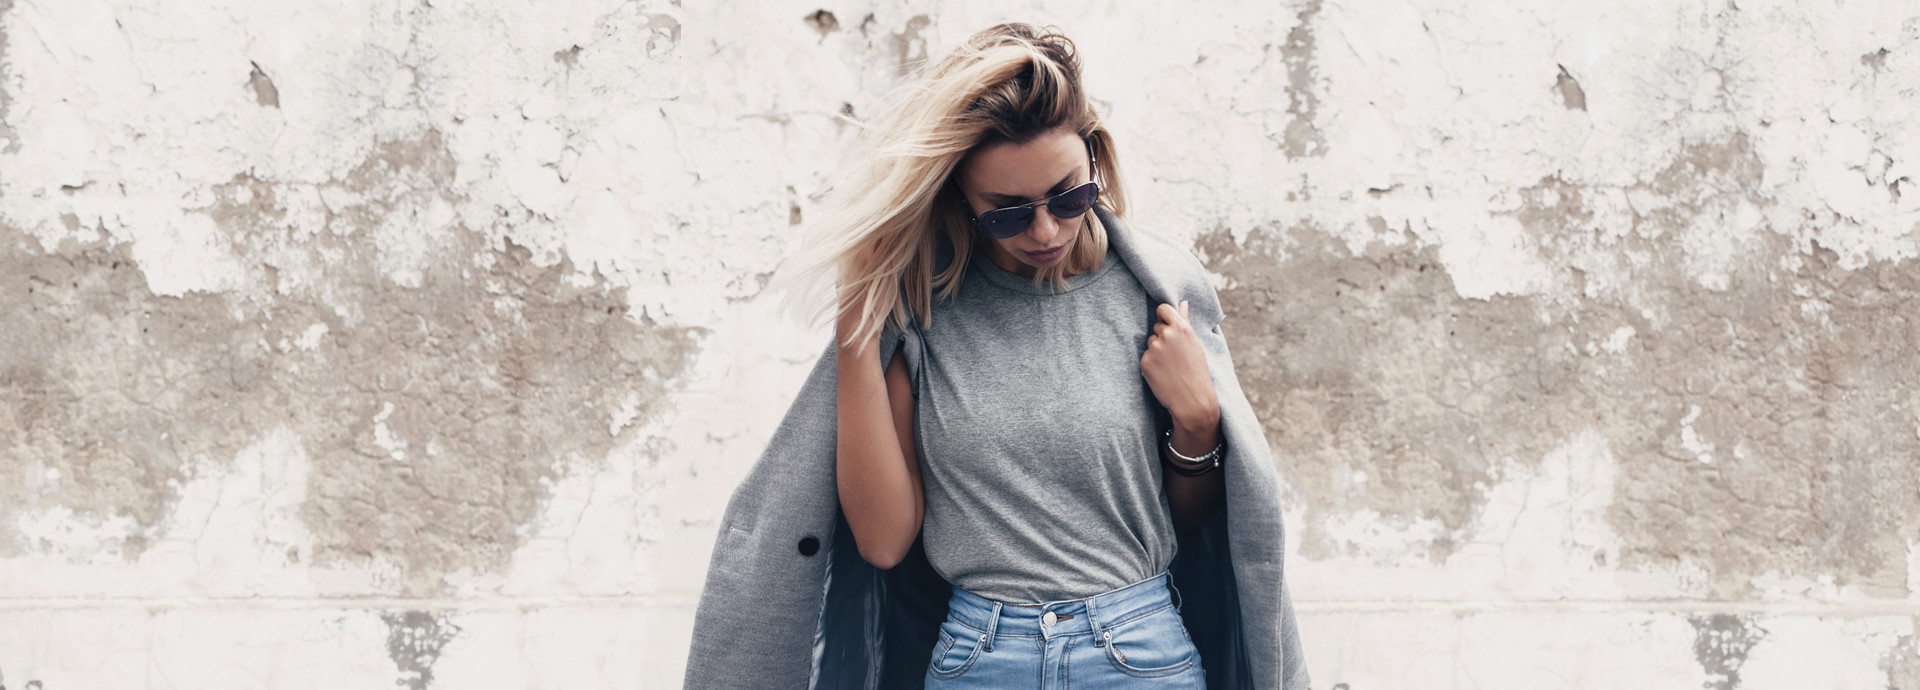 Carrefour Charlesbourg - Mode femme et mode homme